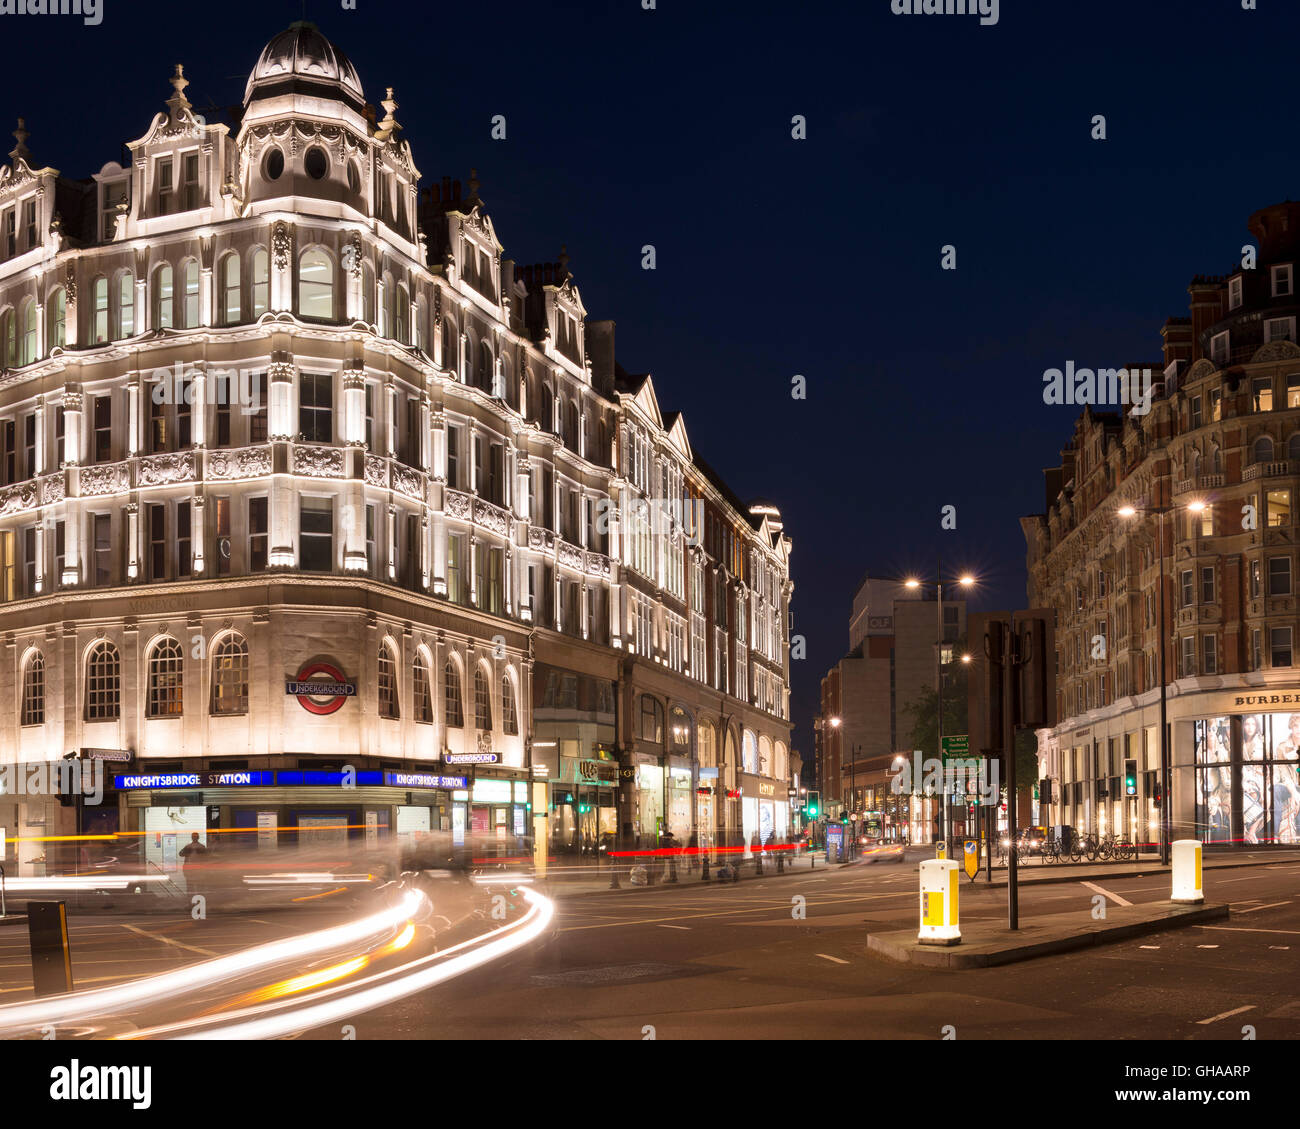 London knightsbridge underground station stock photos for Knights bridge